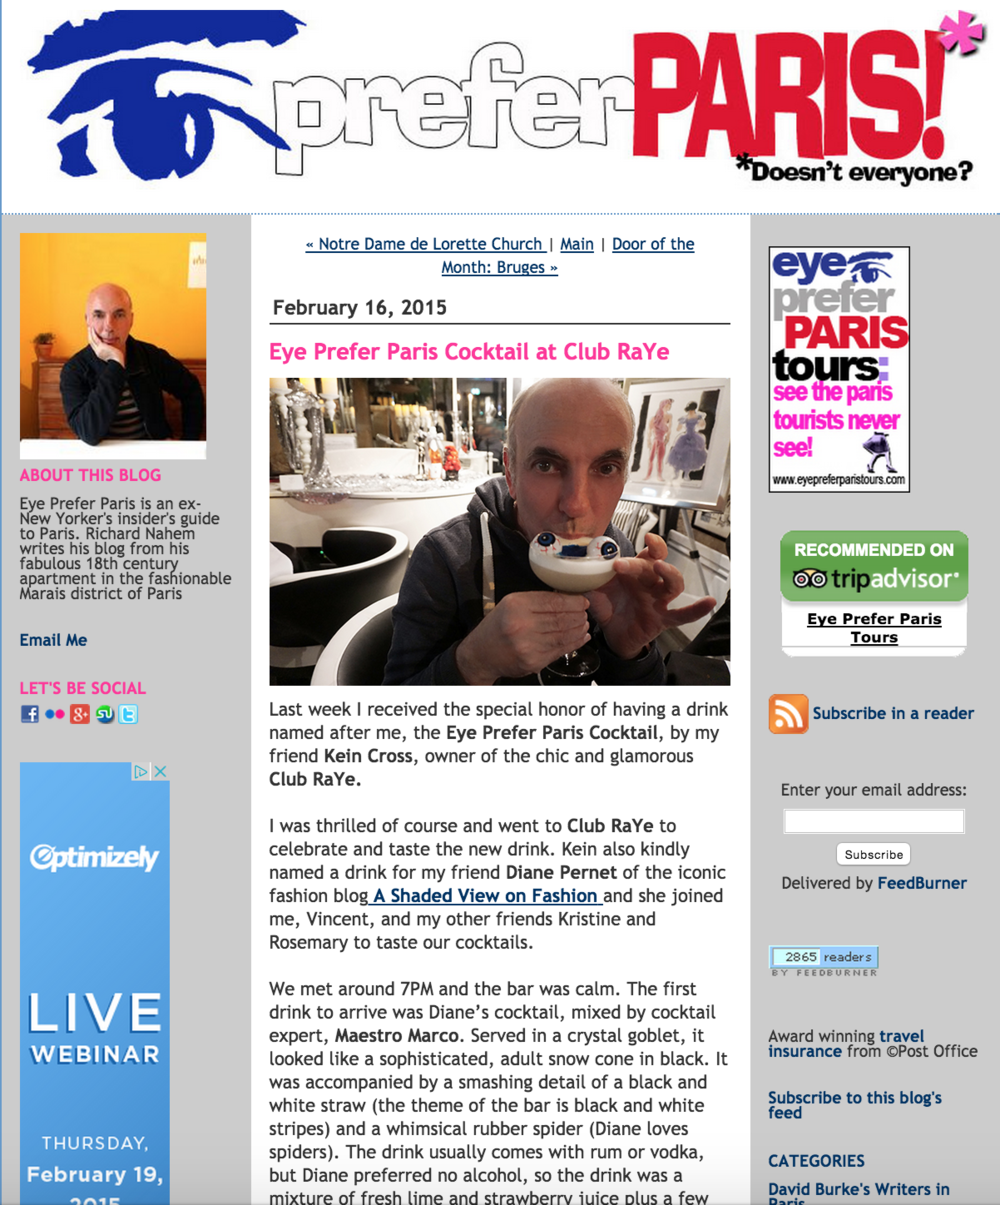 Eye Prefer Paris Cocktail at Club RaYe - February 2015